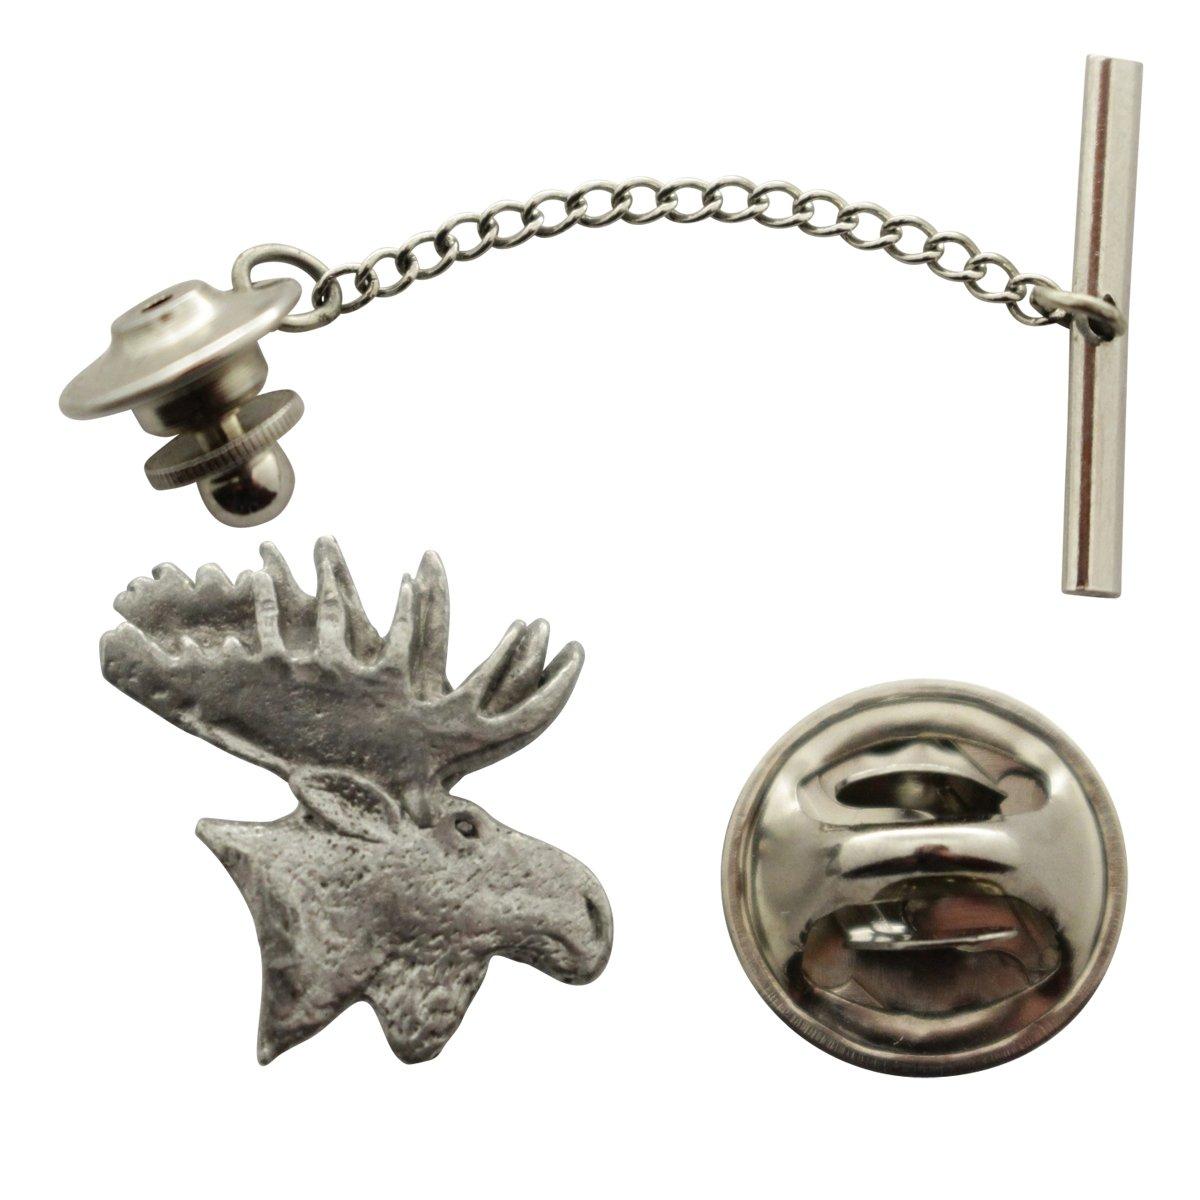 Moose Head Tie Tack ~ Antiqued Pewter ~ Tie Tack or Pin ~ Sarah's Treats & Treasures